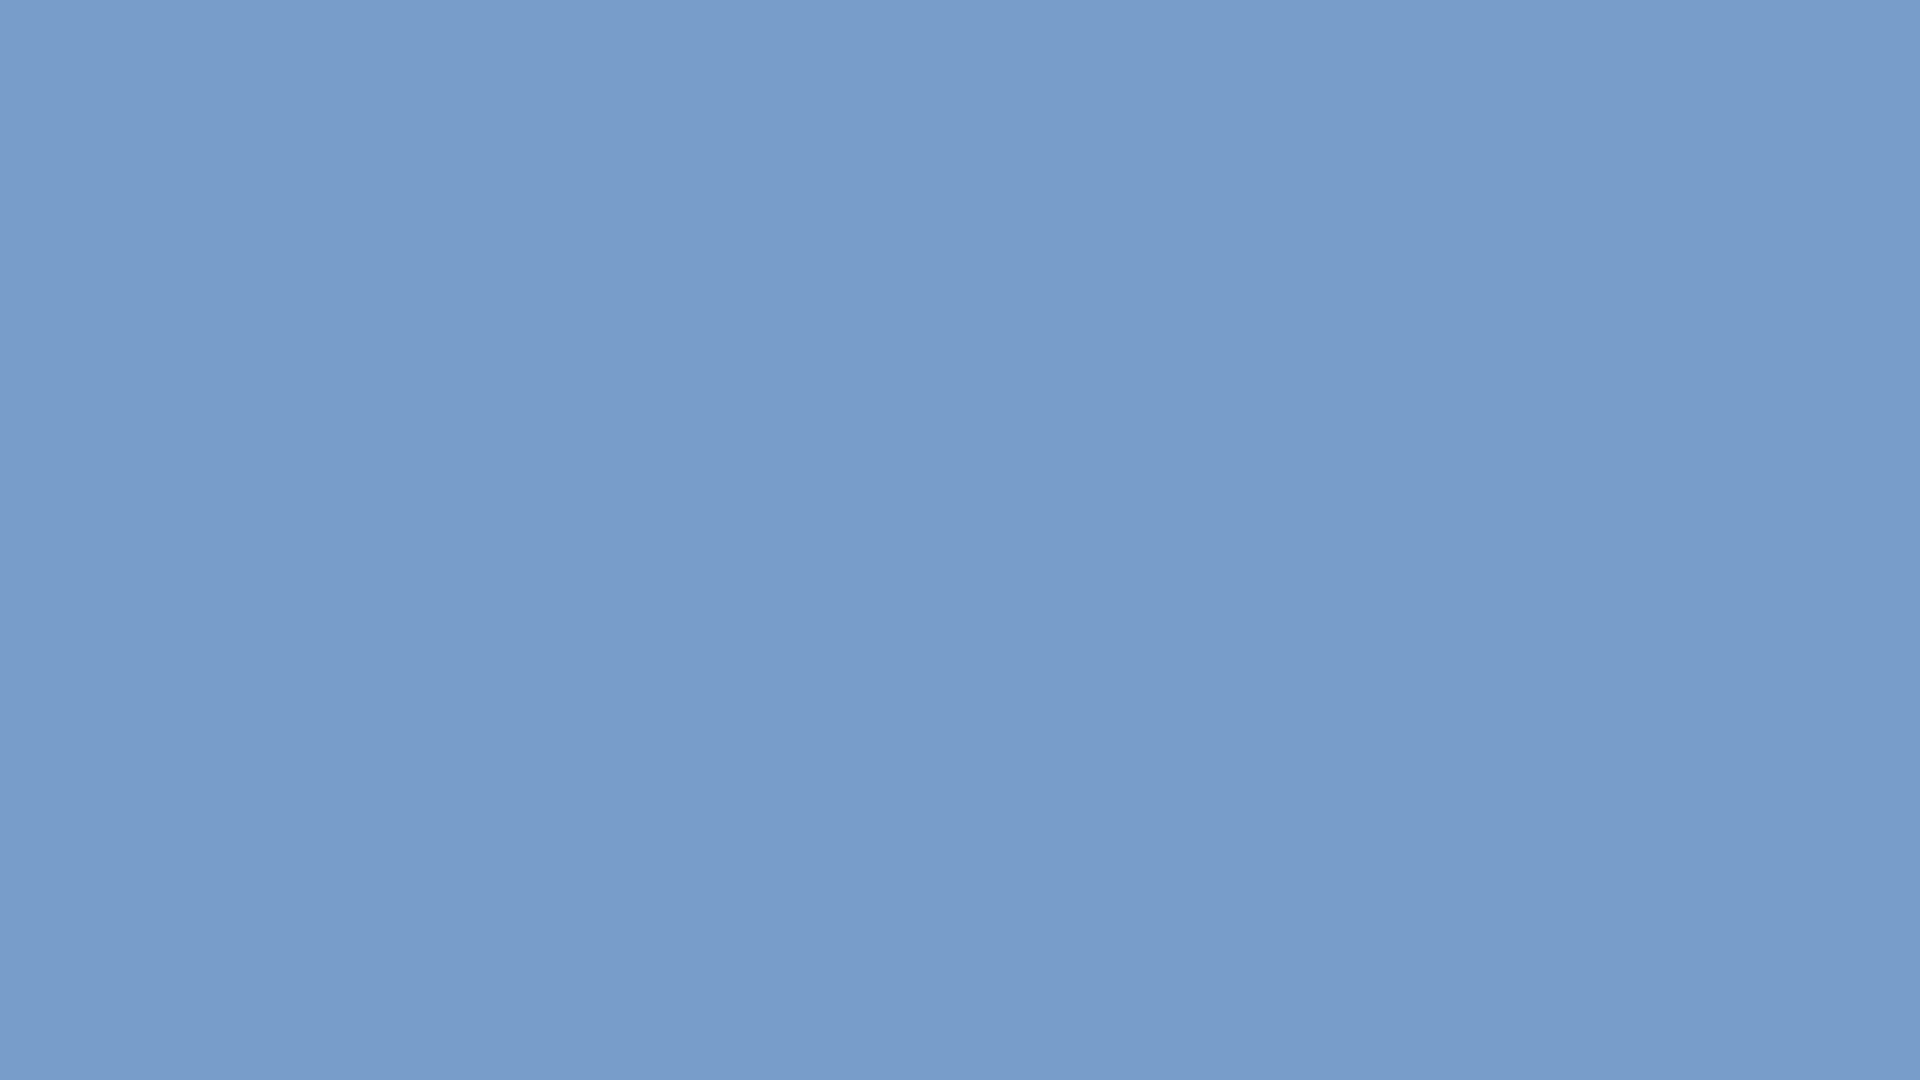 1920x1080 Dark Pastel Blue Solid Color Background